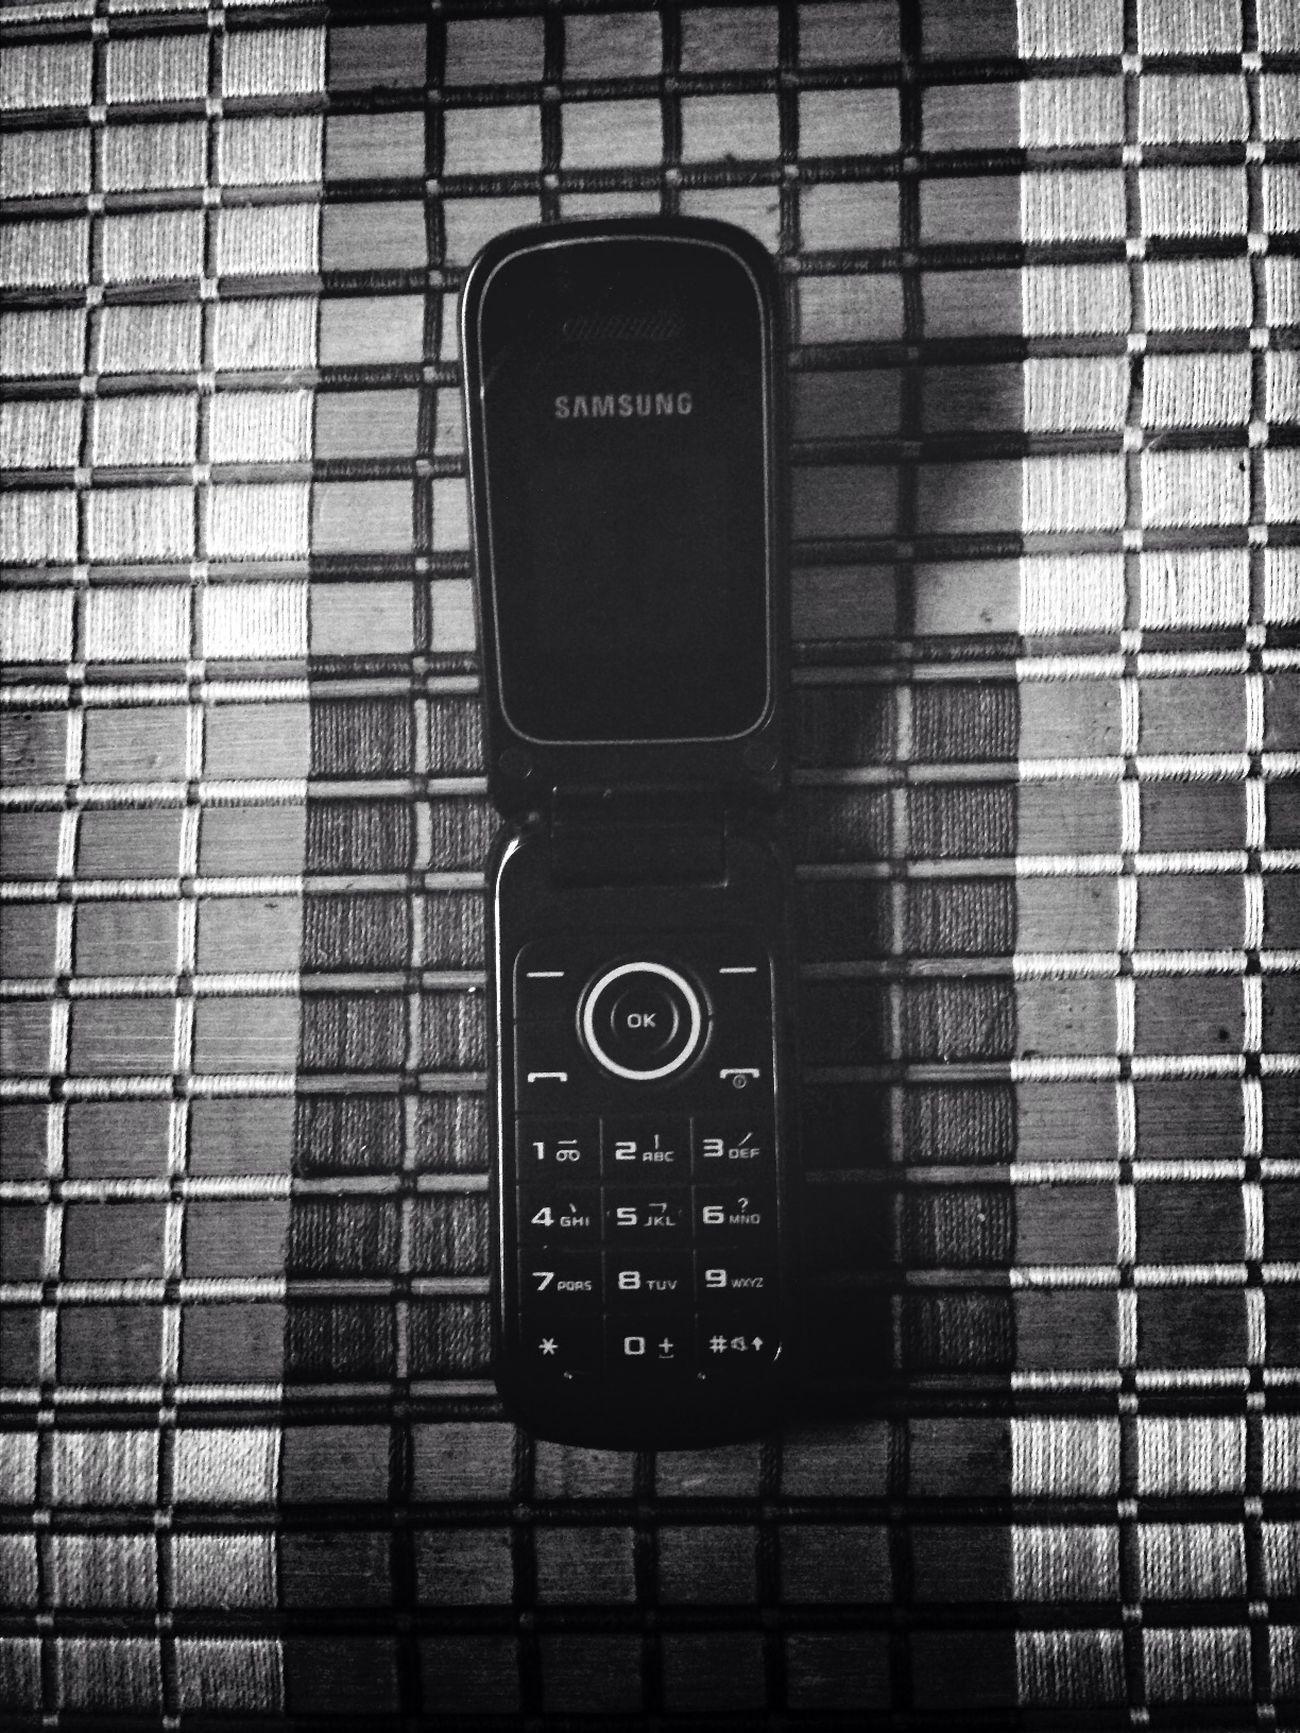 My phone hehe